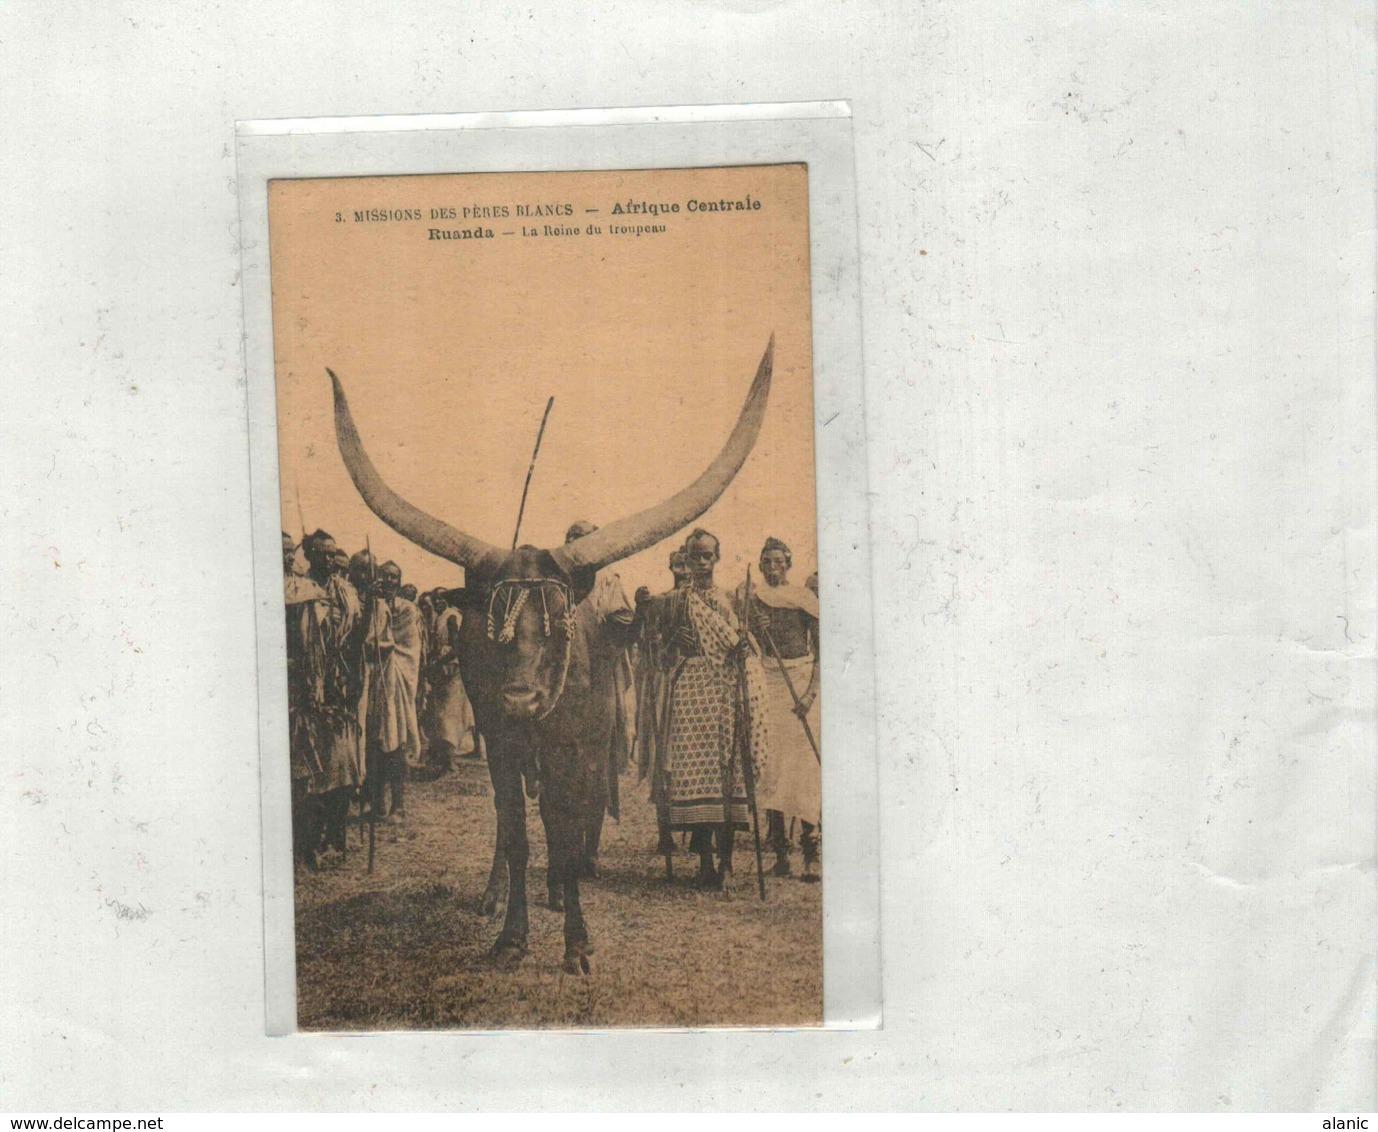 RUANDA-URUNDI - Missions Des Pères Blancs - Vache Sacrée Reine Du Troupeau - Ruanda-Urundi